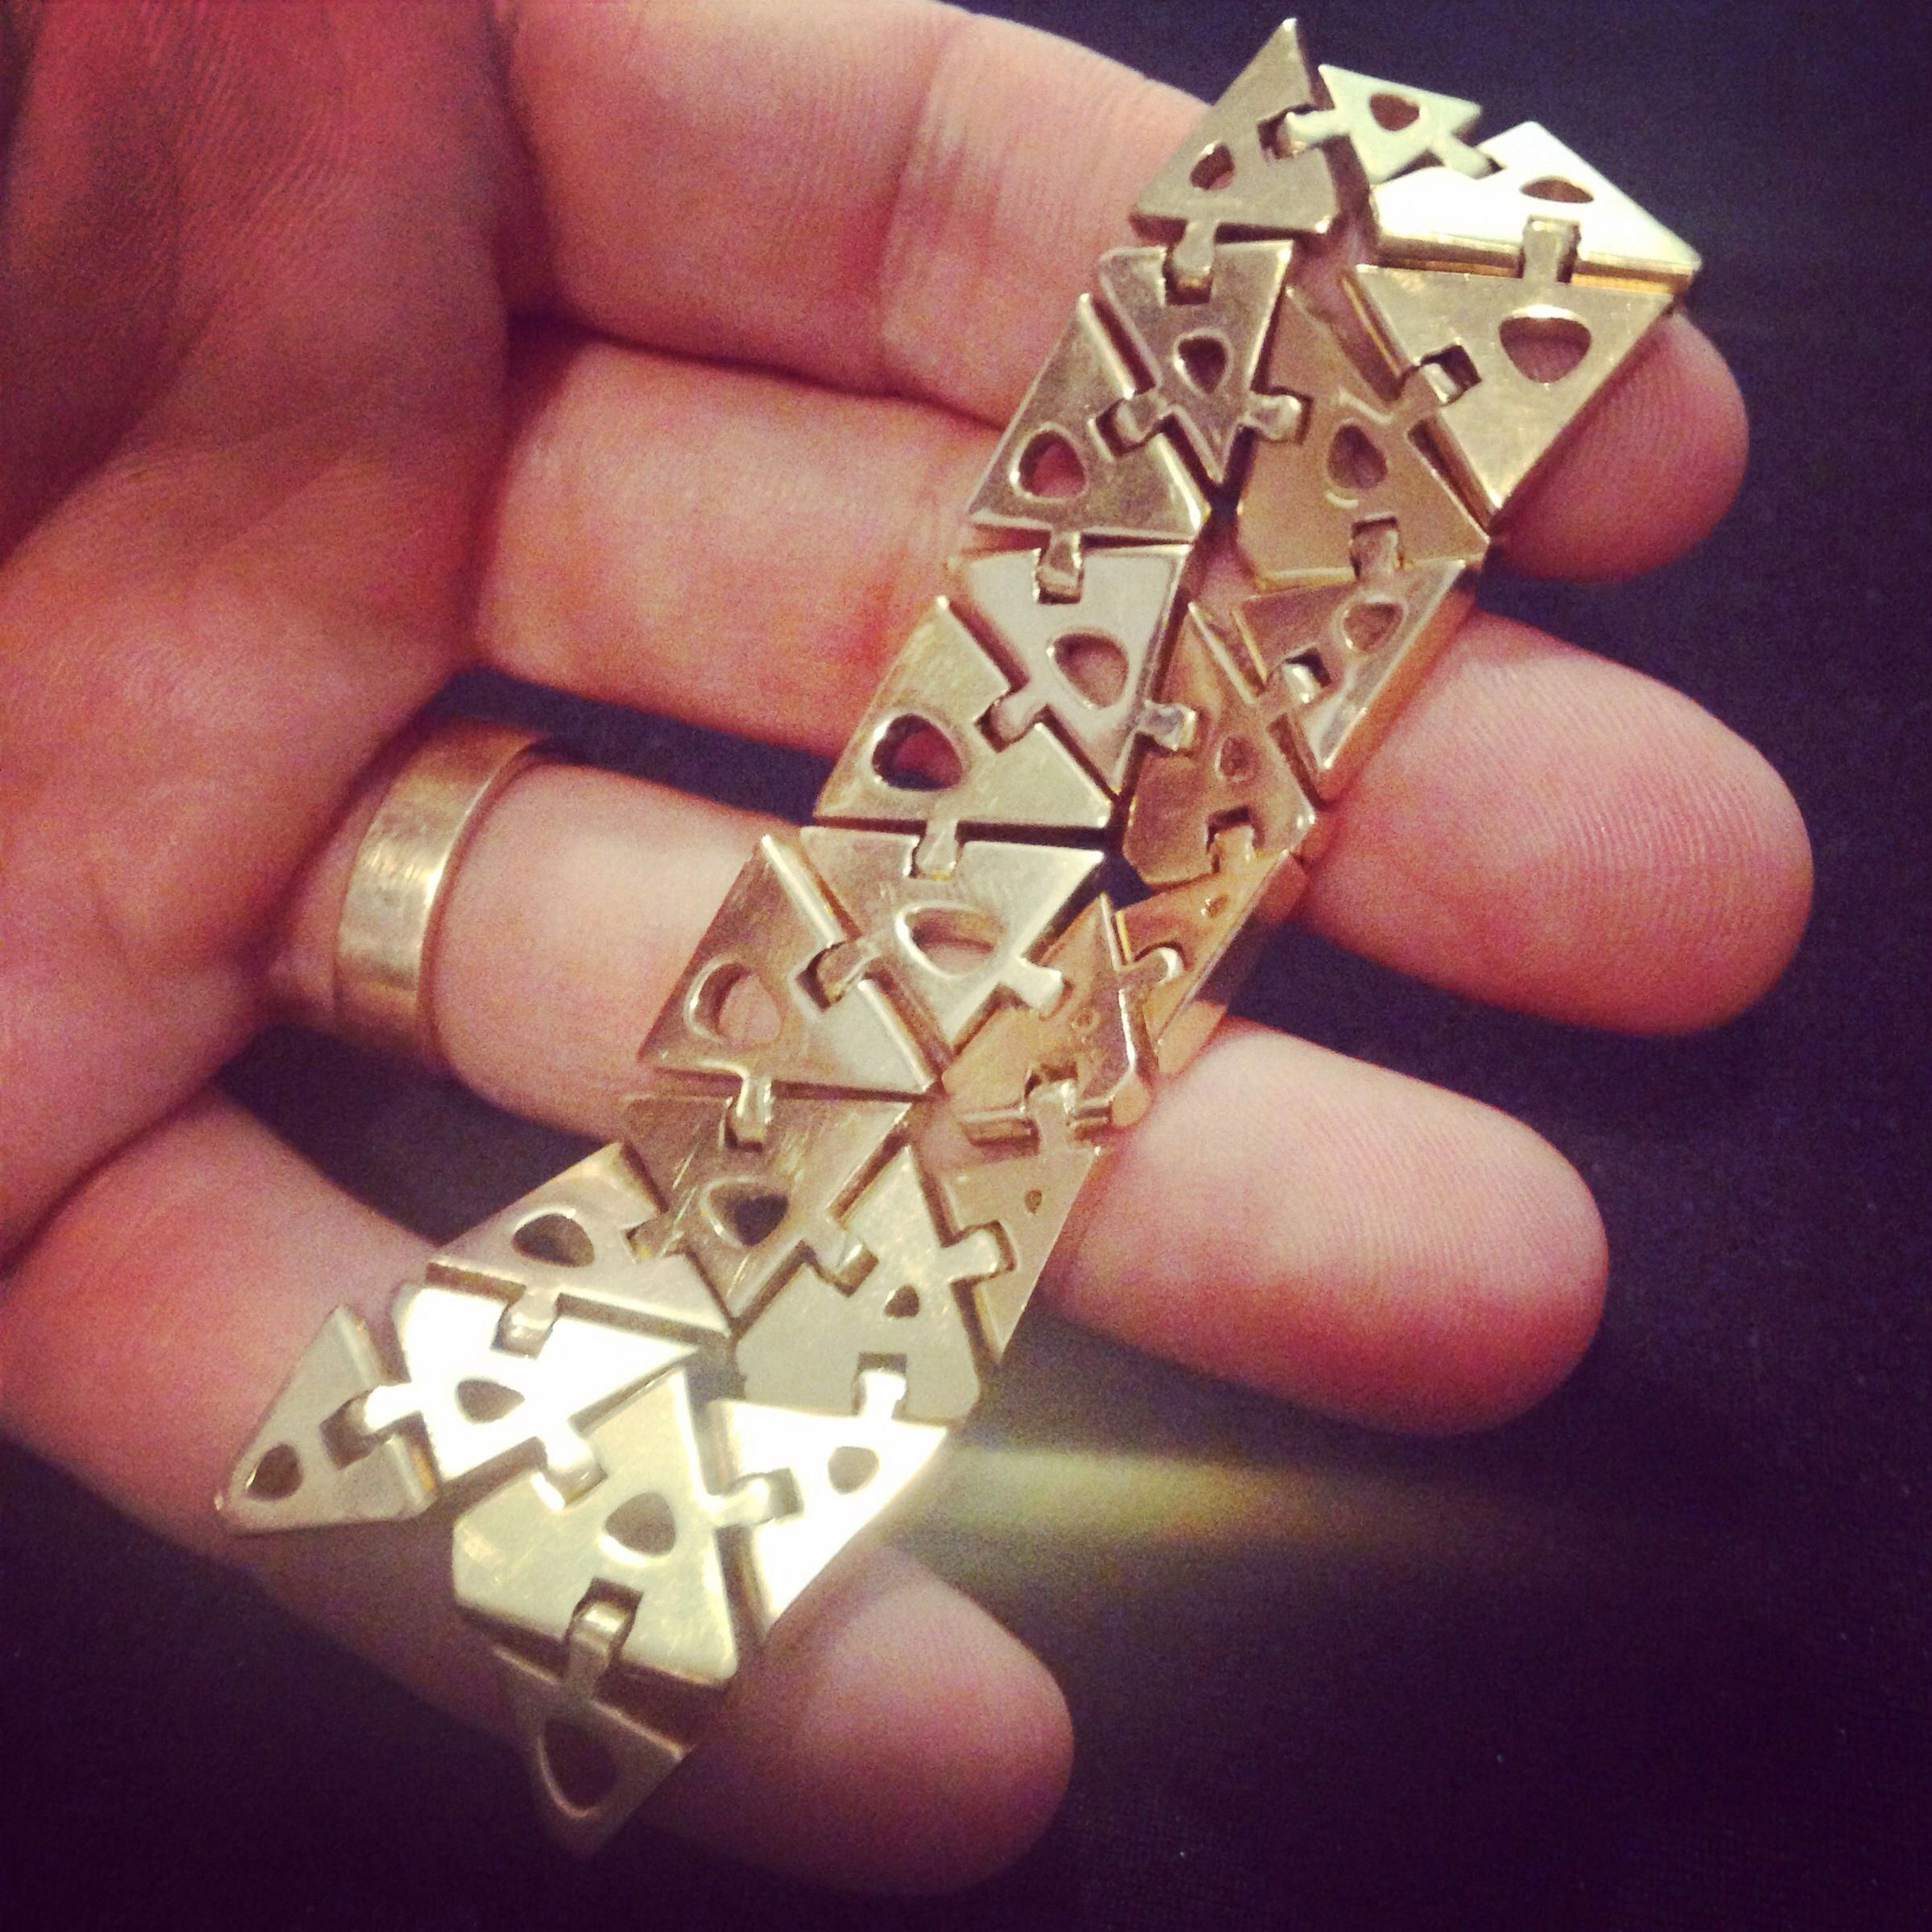 3d Printed Gold Bracelet #3dprinting